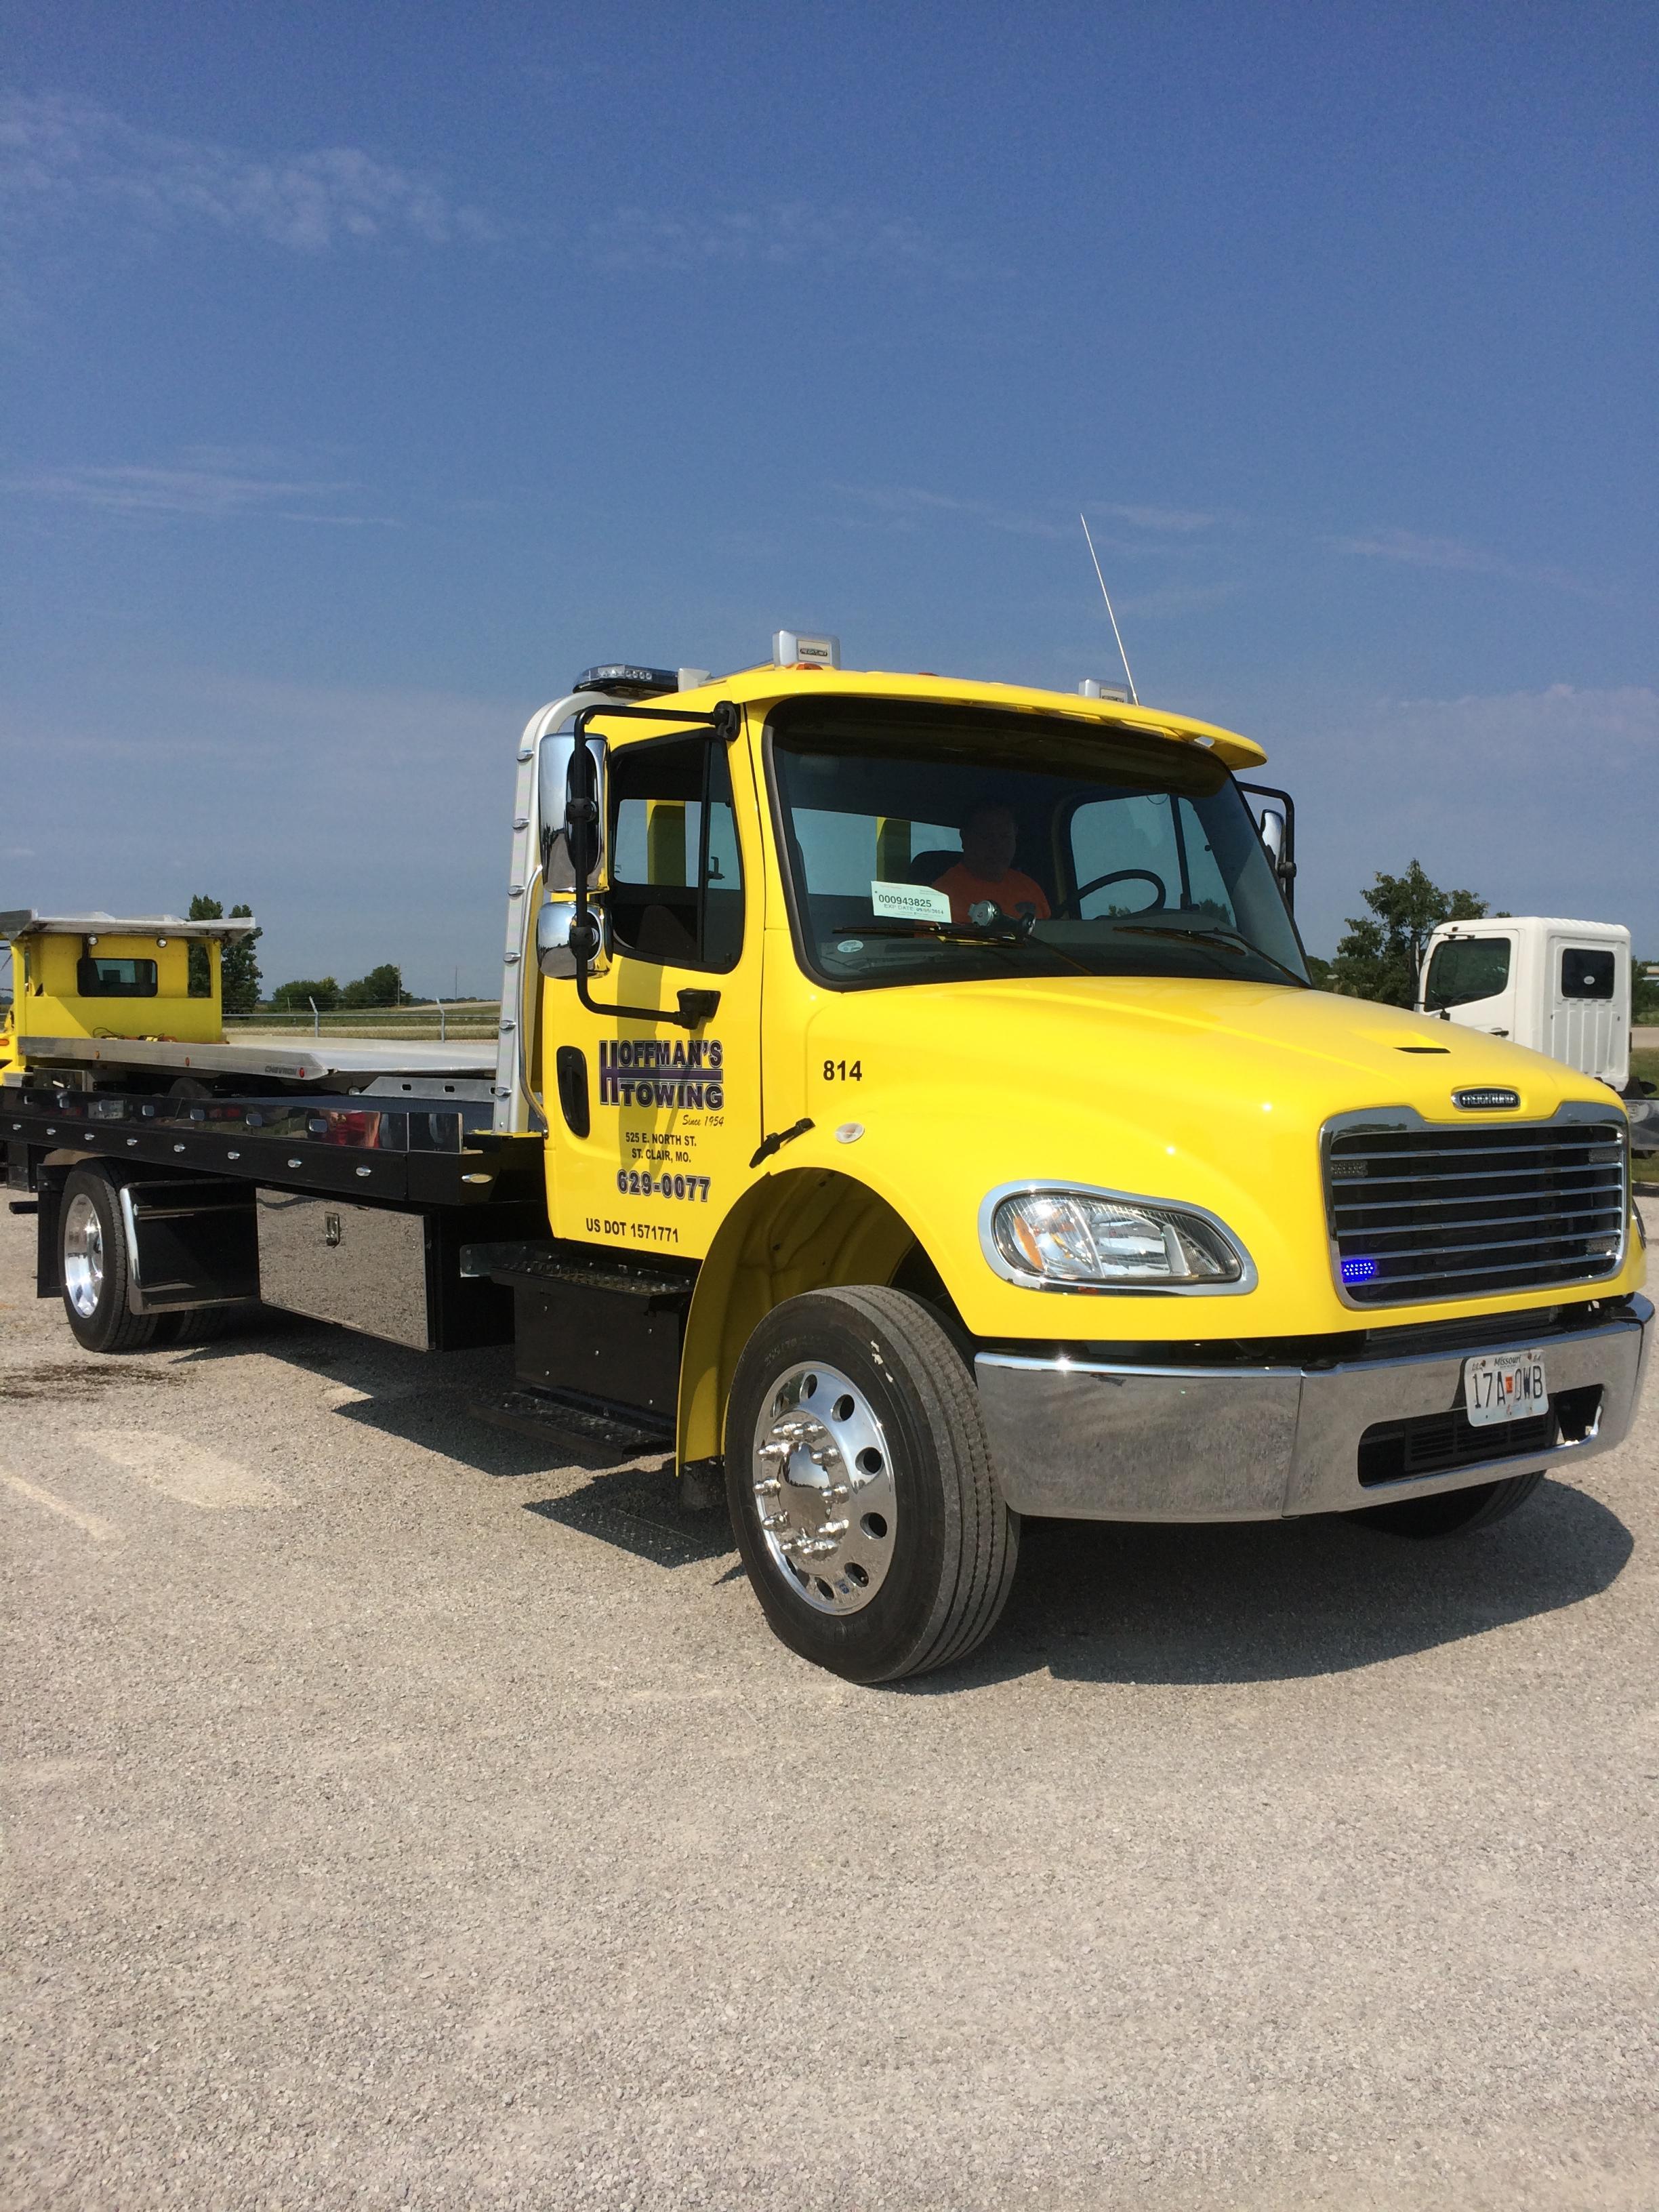 Hoffman's Towing & Service Inc image 4